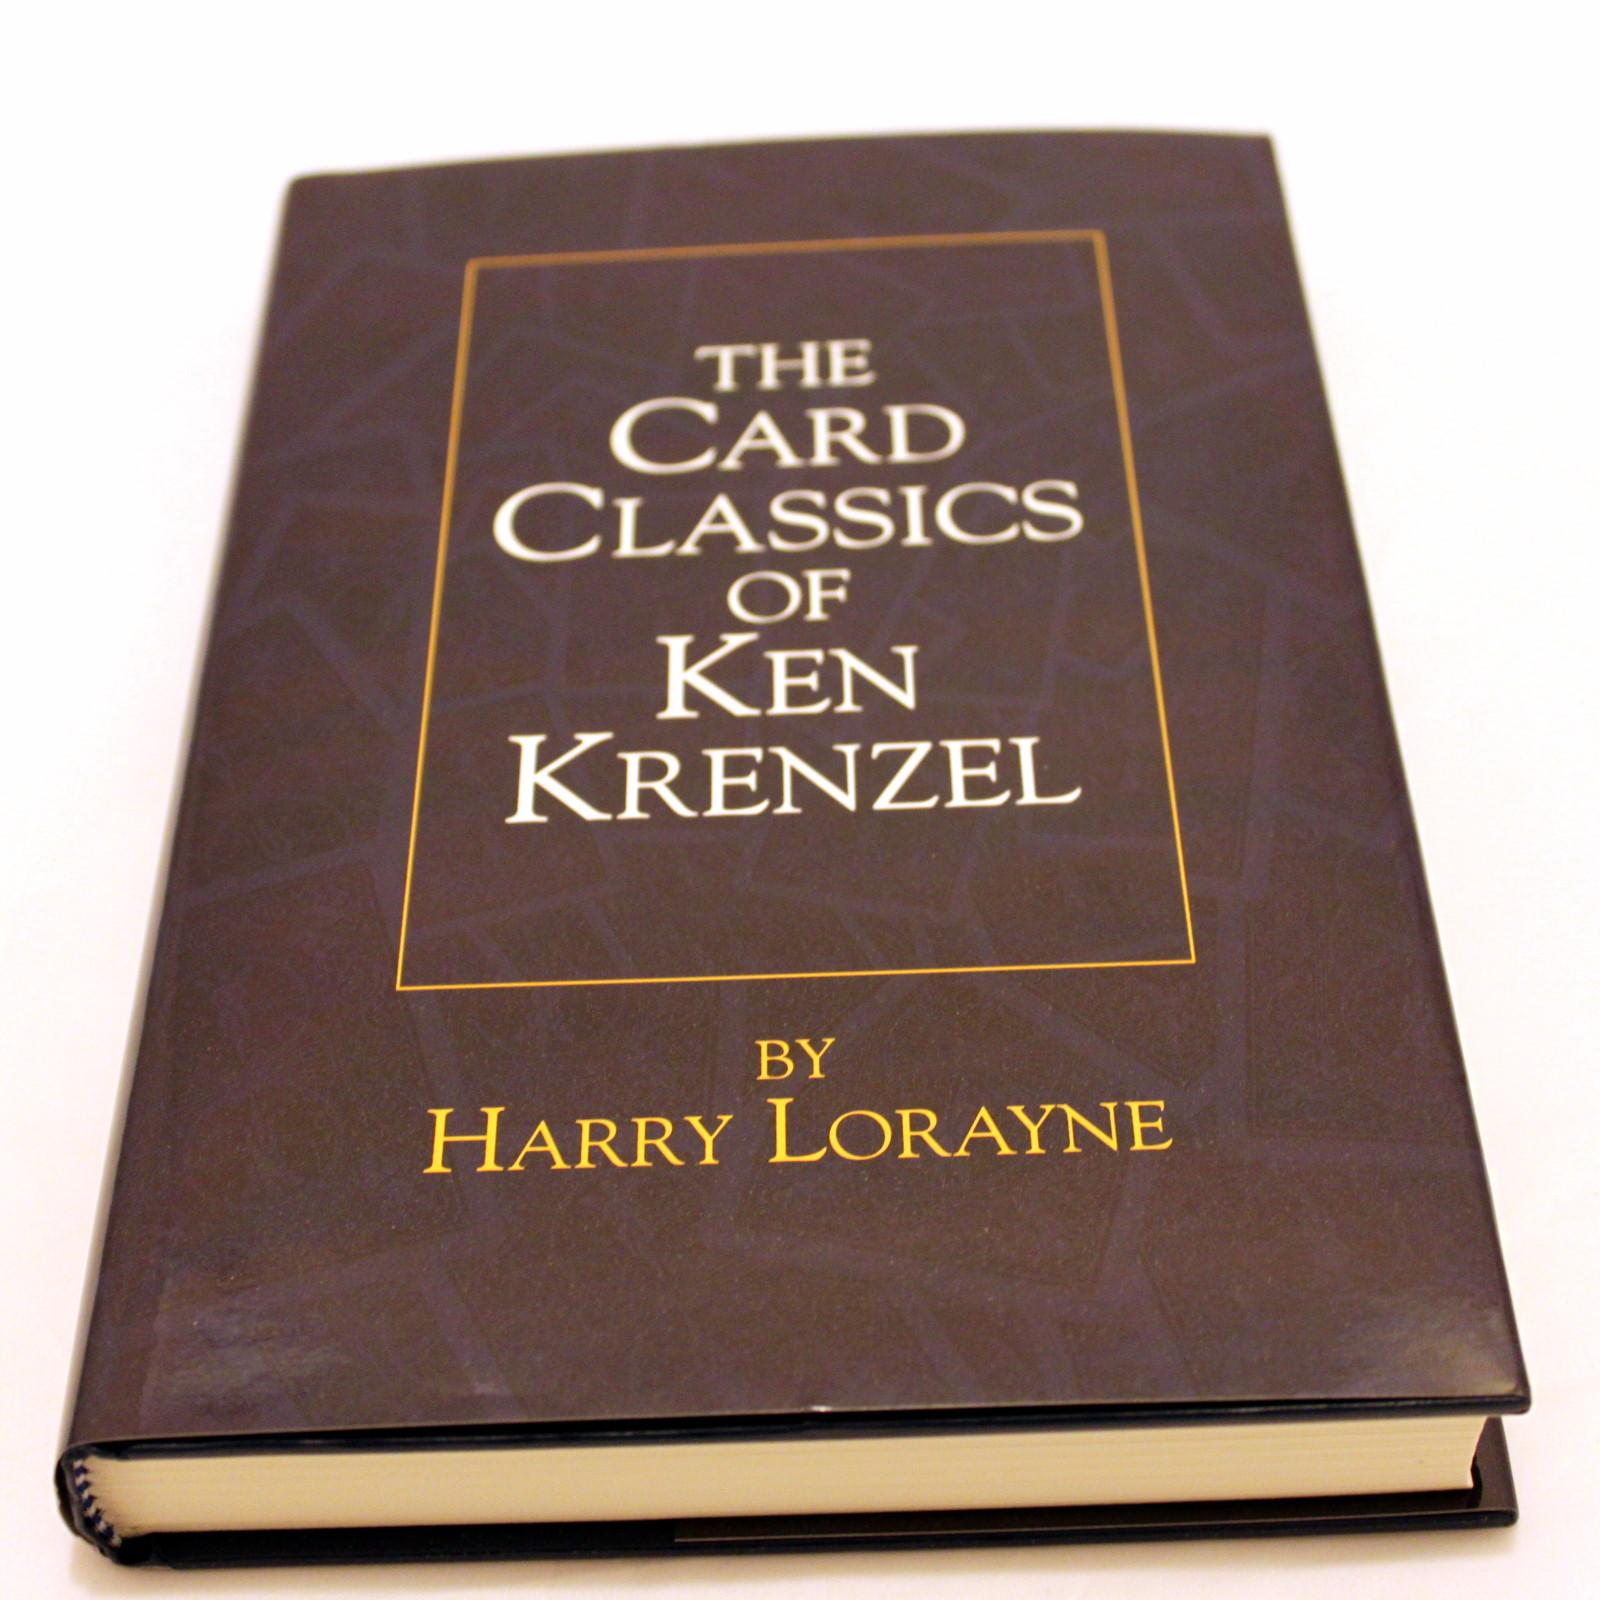 Card Classics of Ken Krenzel, The by Harry Lorayne